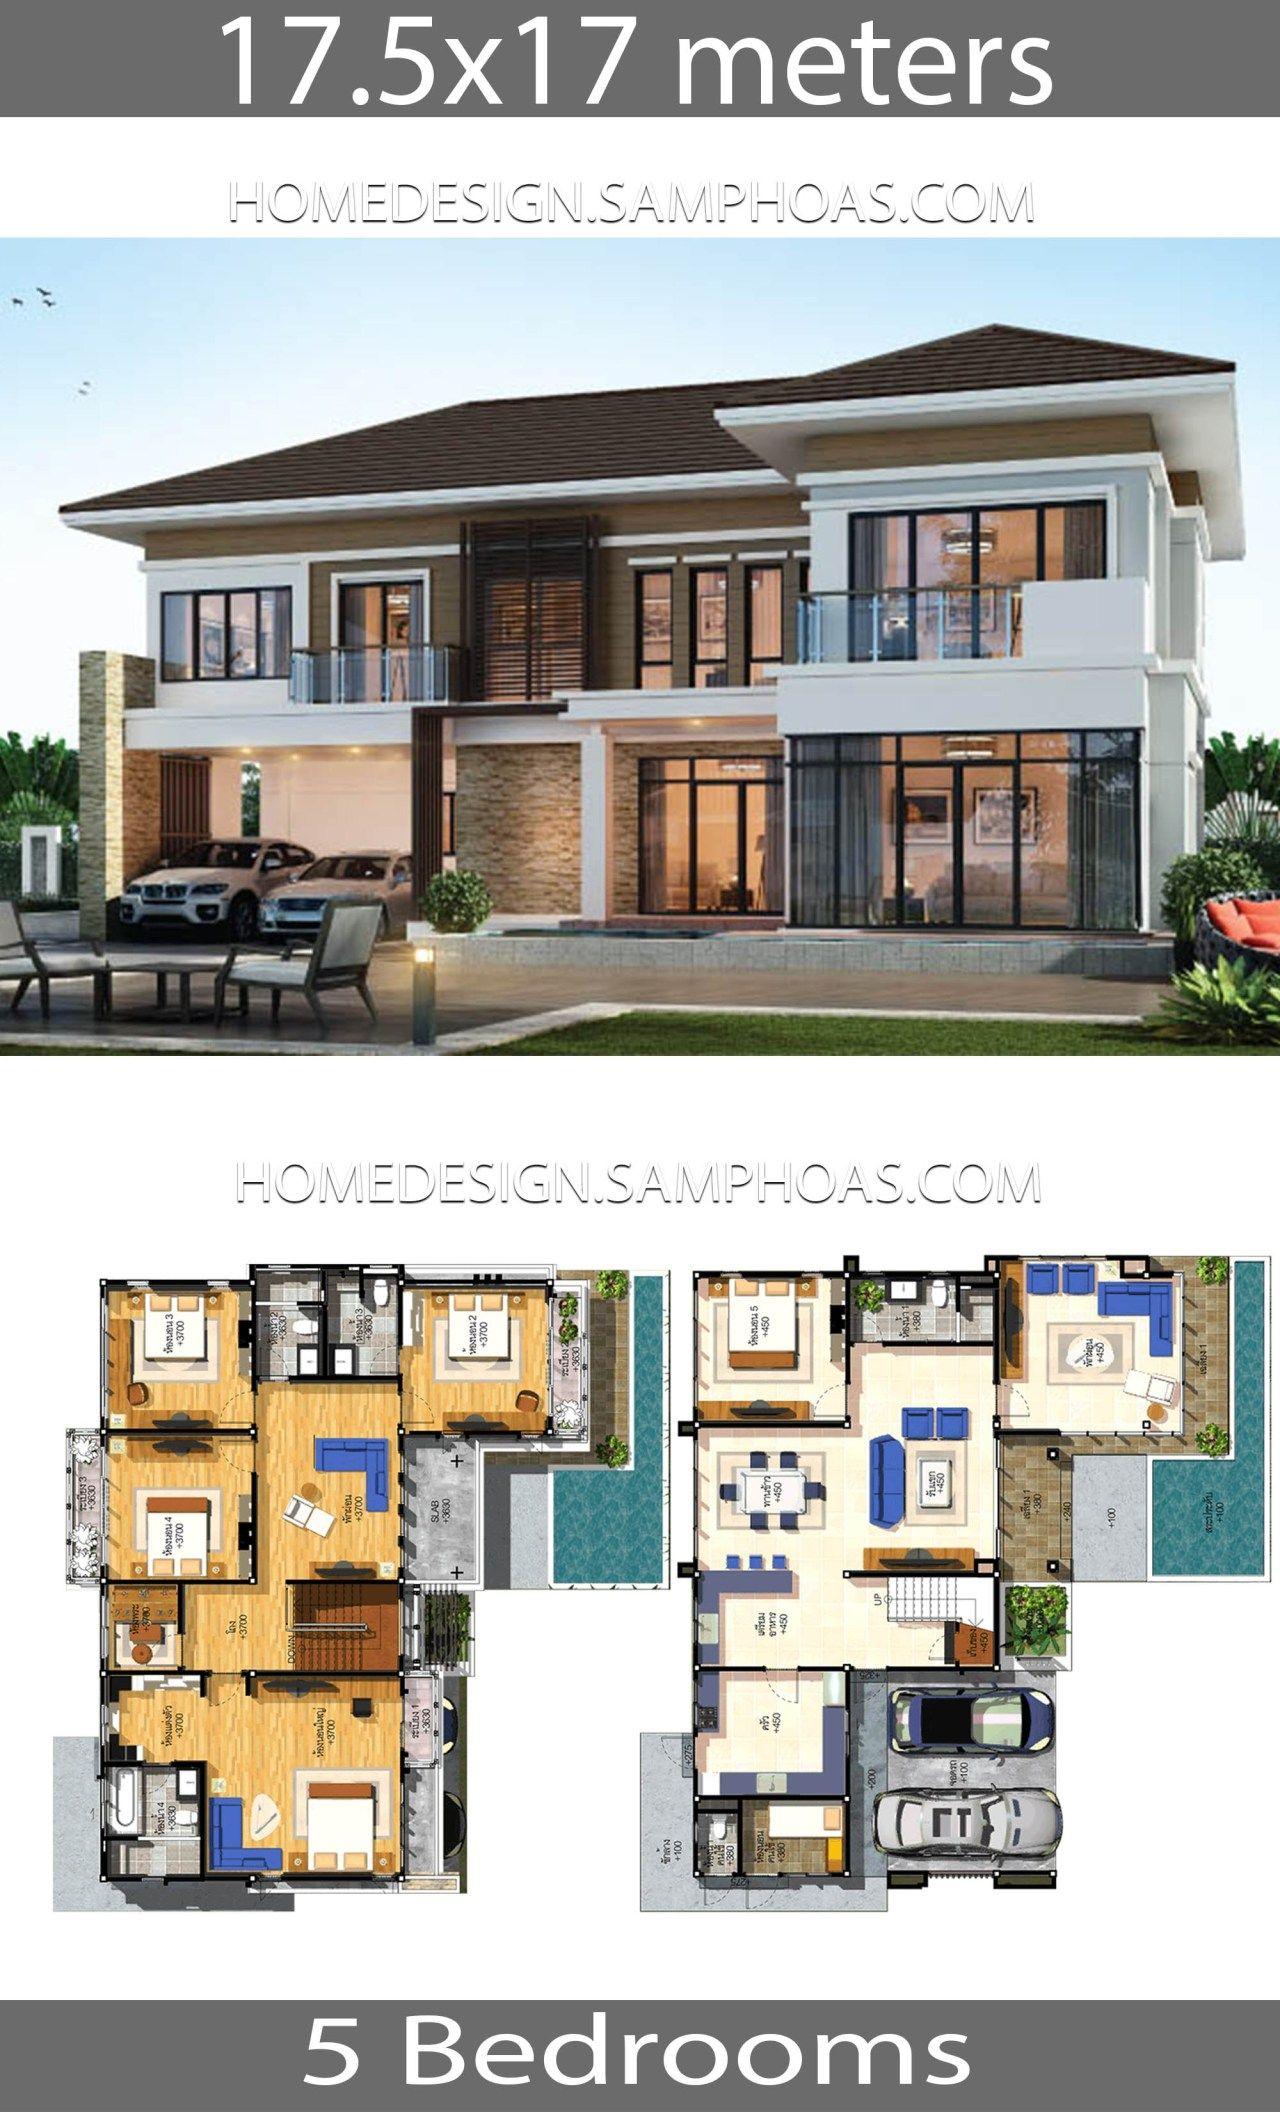 House Plans Idea 17 5x17 With 5 Bedrooms Home Ideas House Blueprints House Plans Mansion Modern House Floor Plans